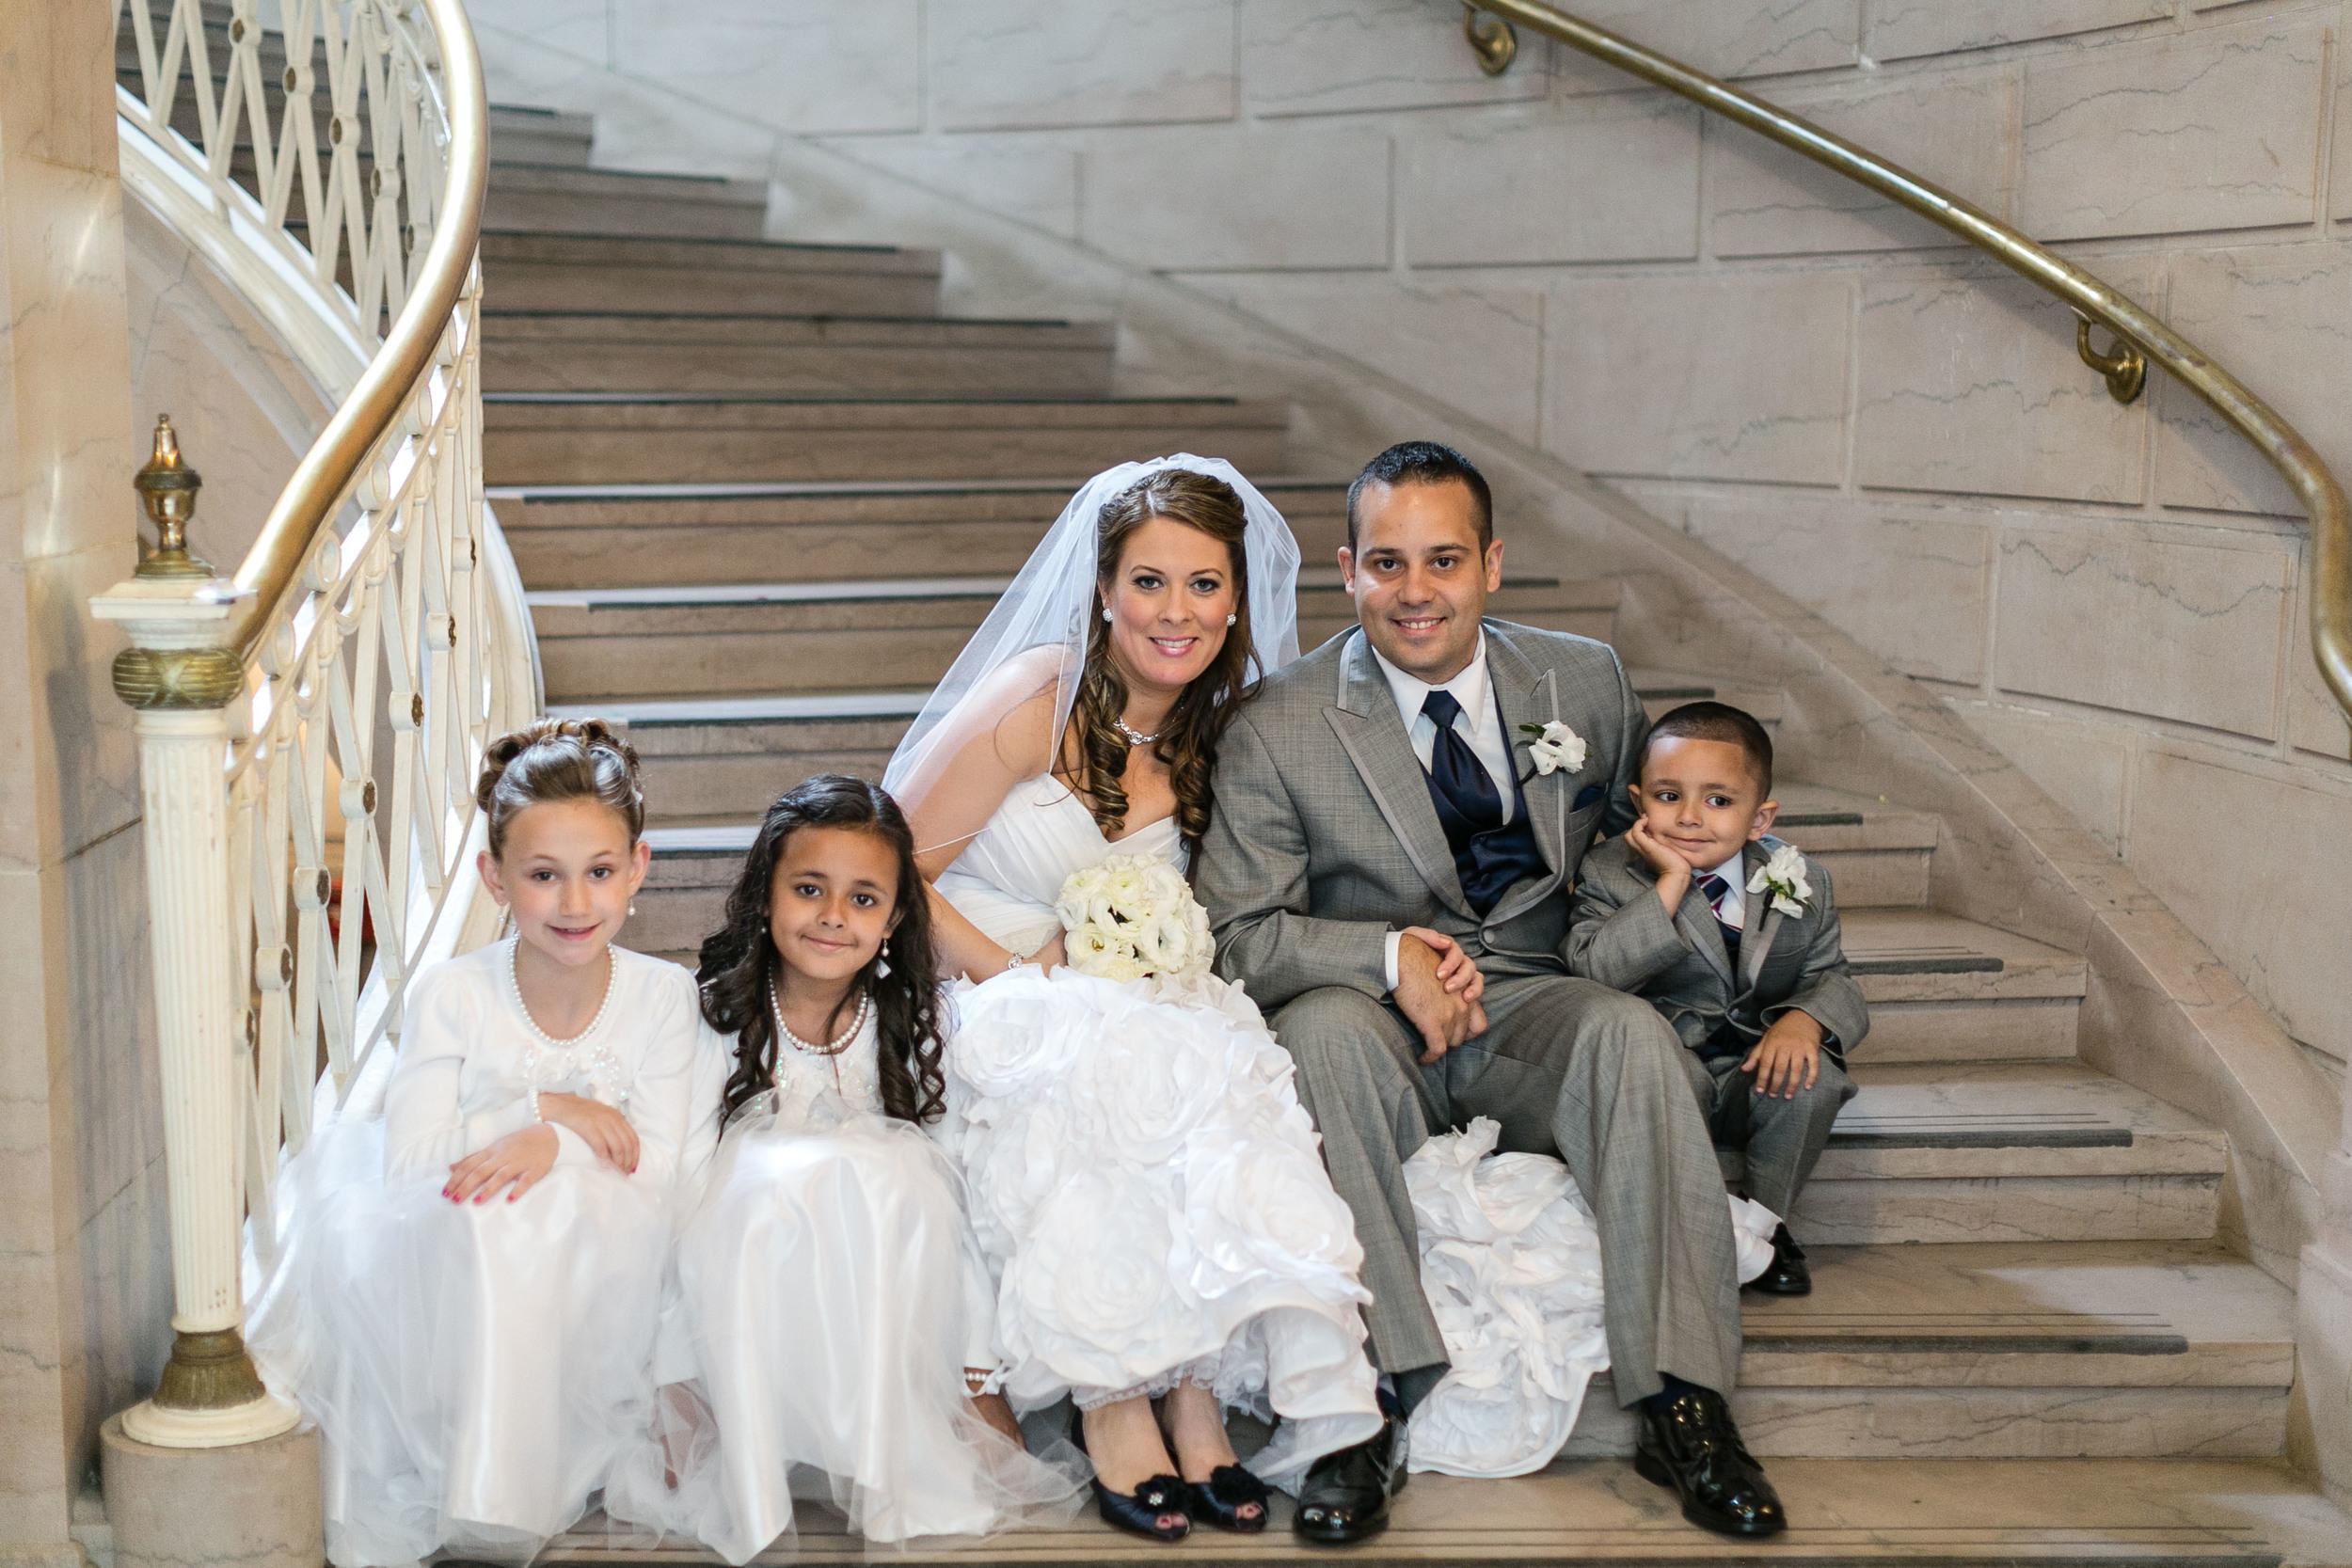 Puerto-Rican-Wedding-Hartford-City-Hall-Connecticut-Jacek-Dolata-Photography-7.jpg